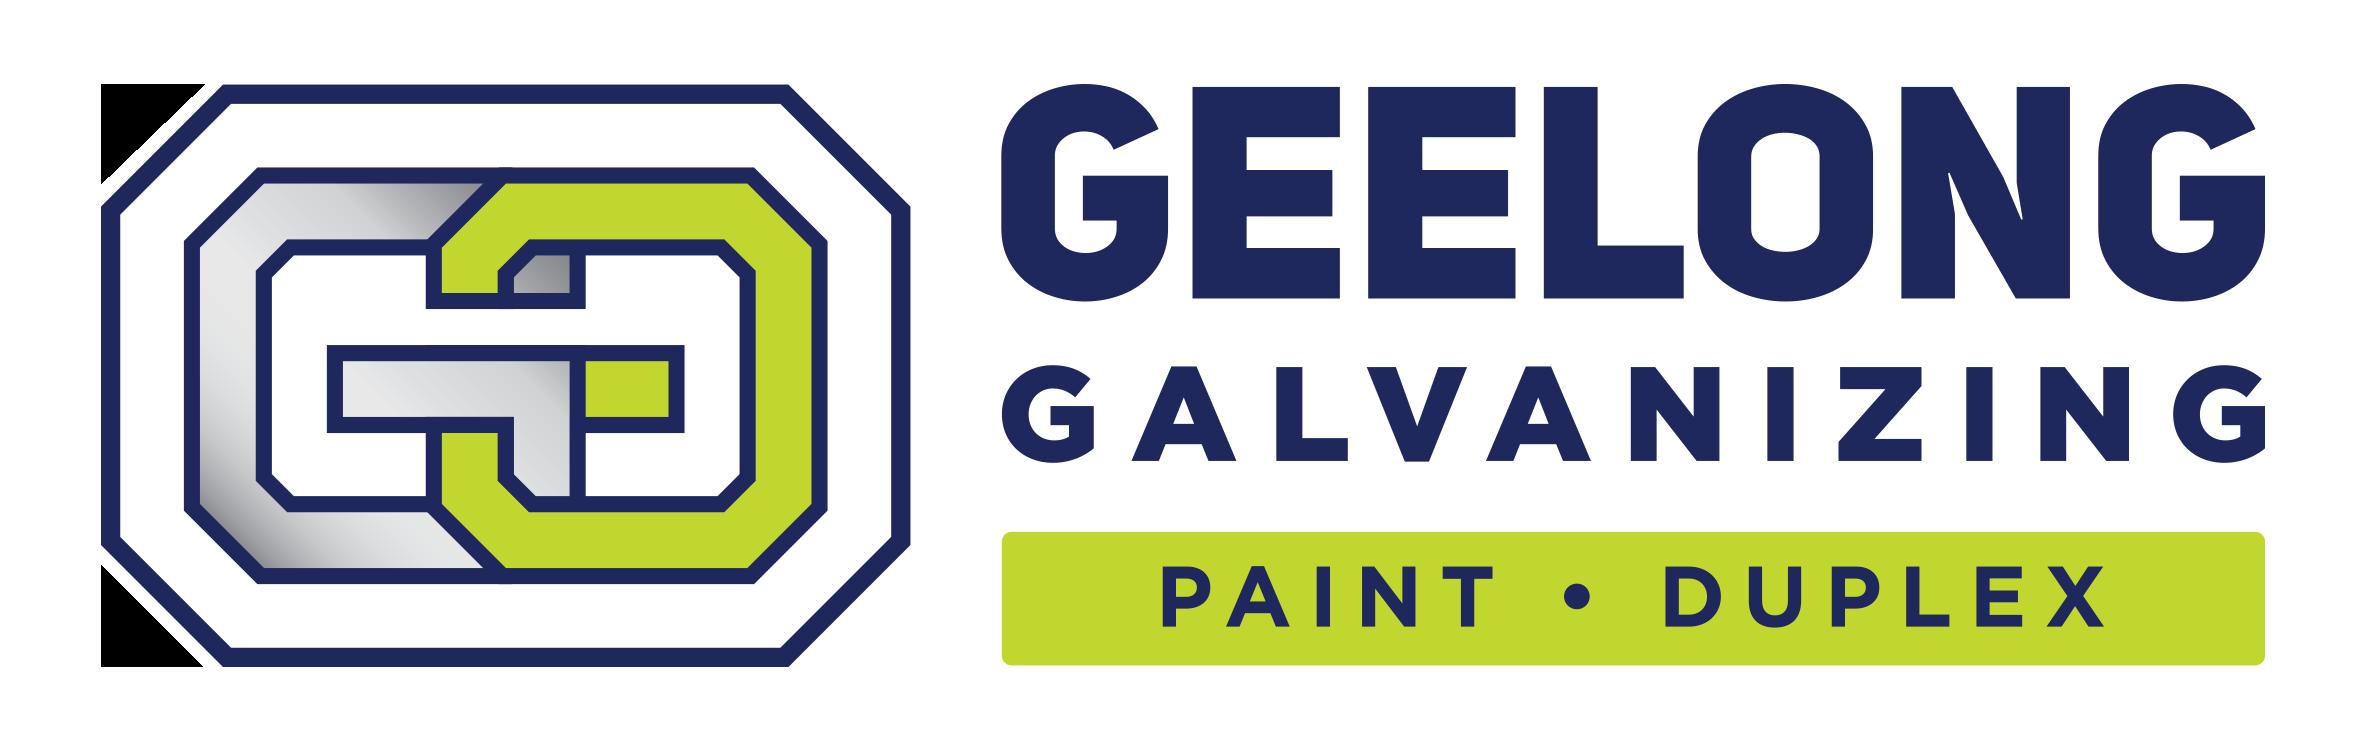 Geelong Galvanizing